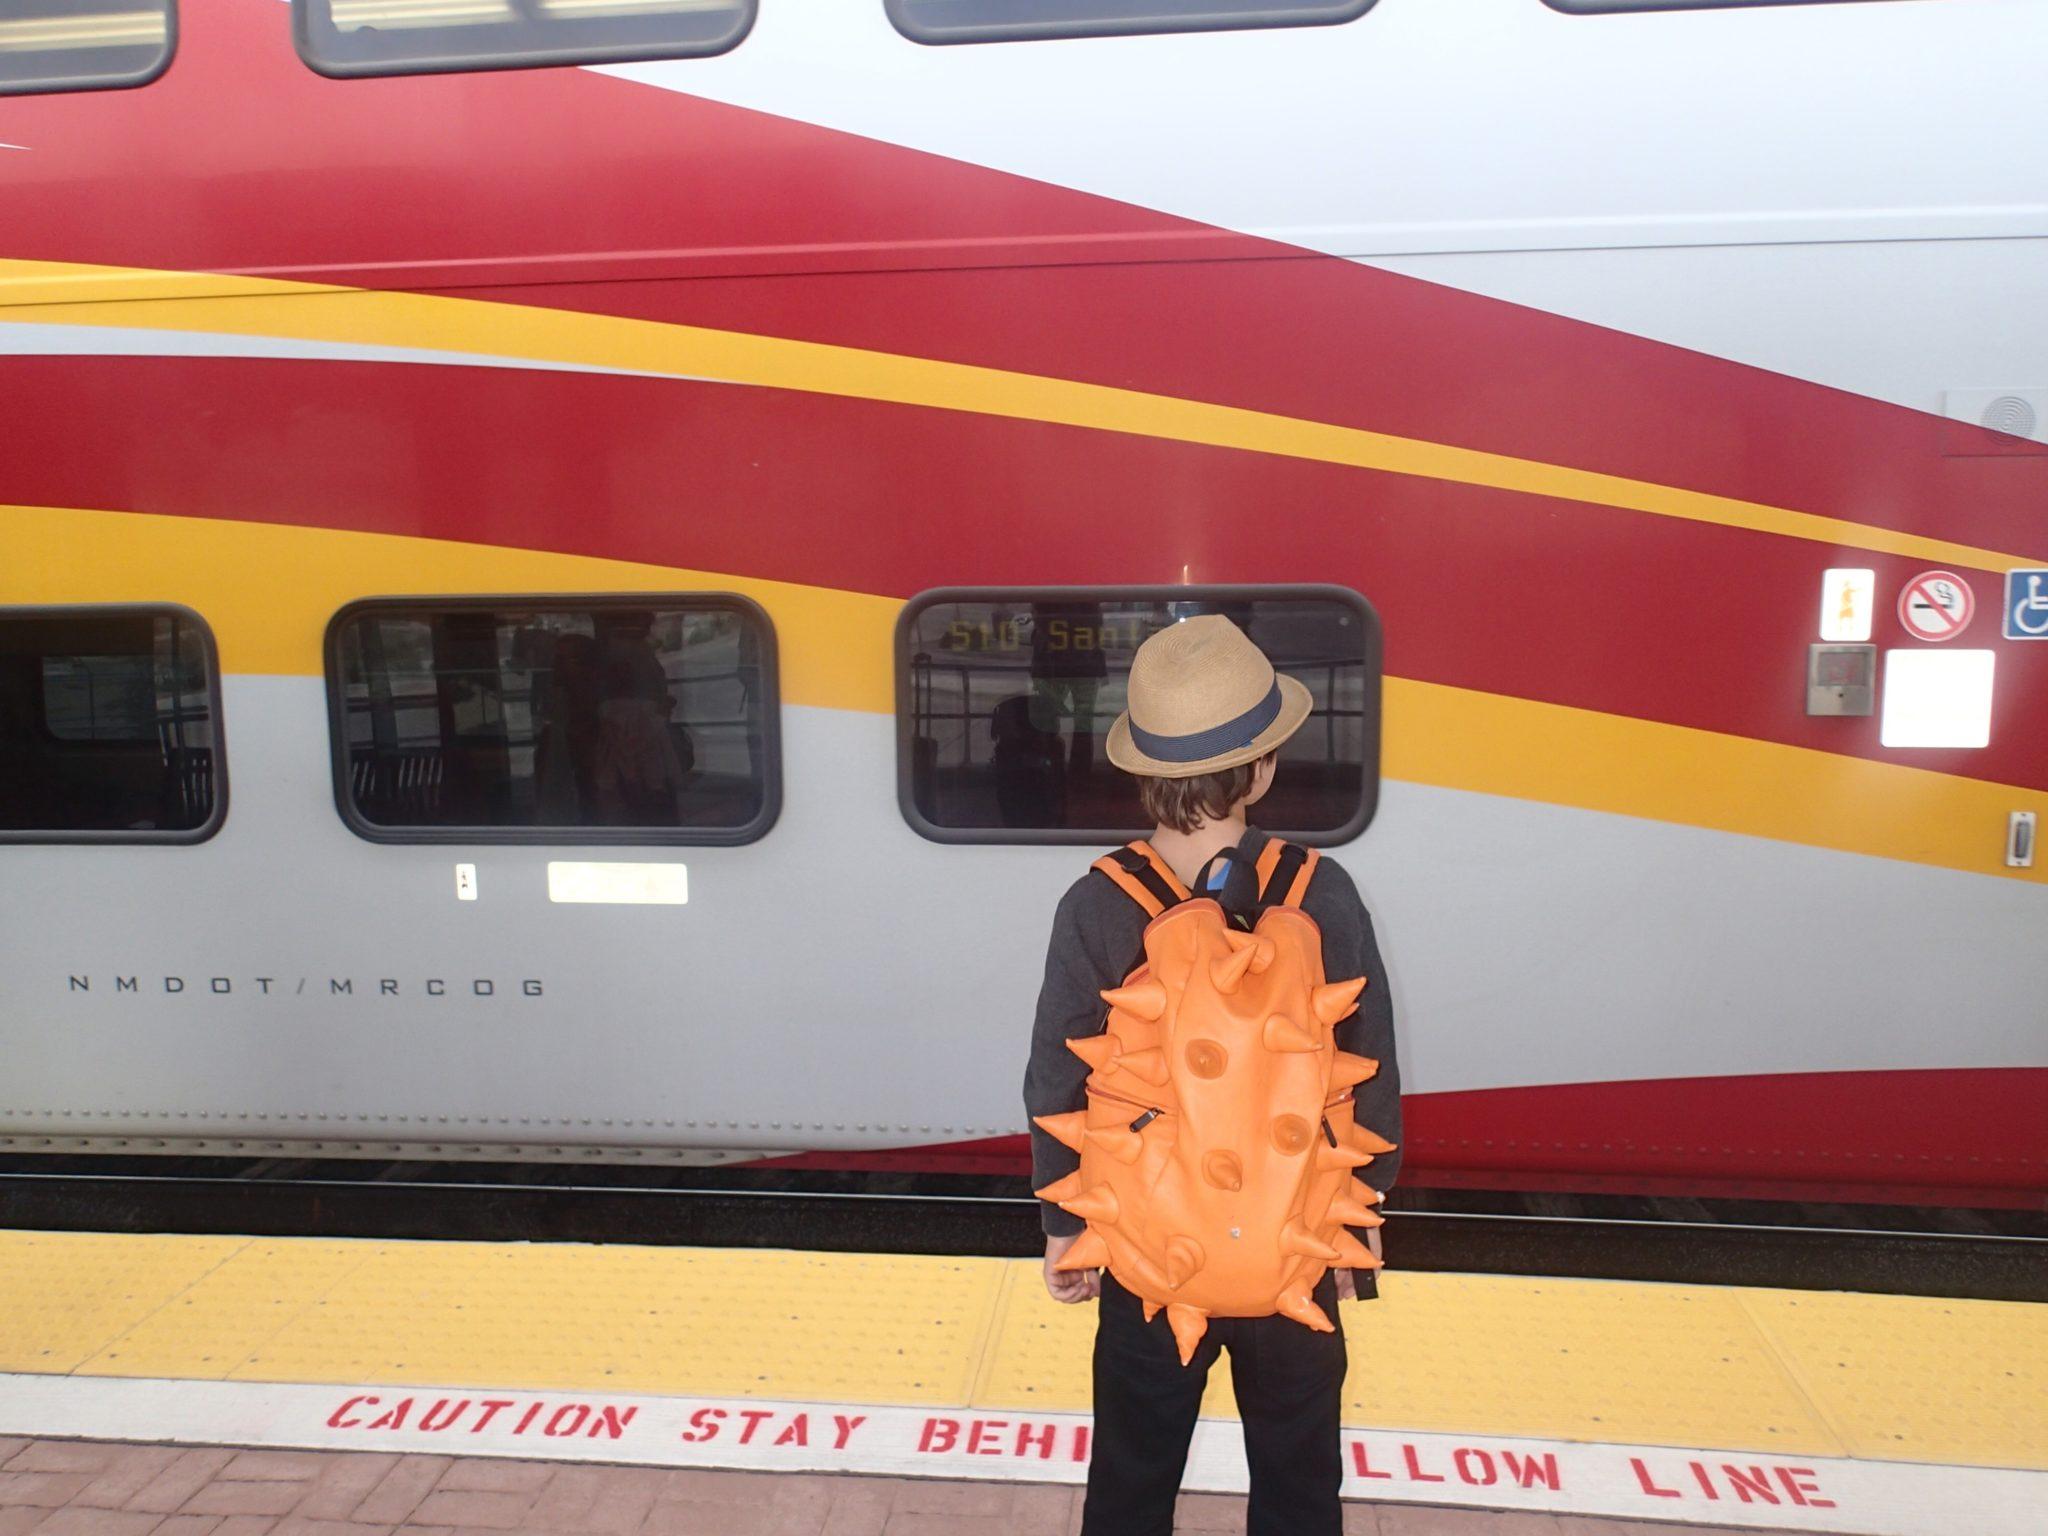 Rail Runner New Mexico